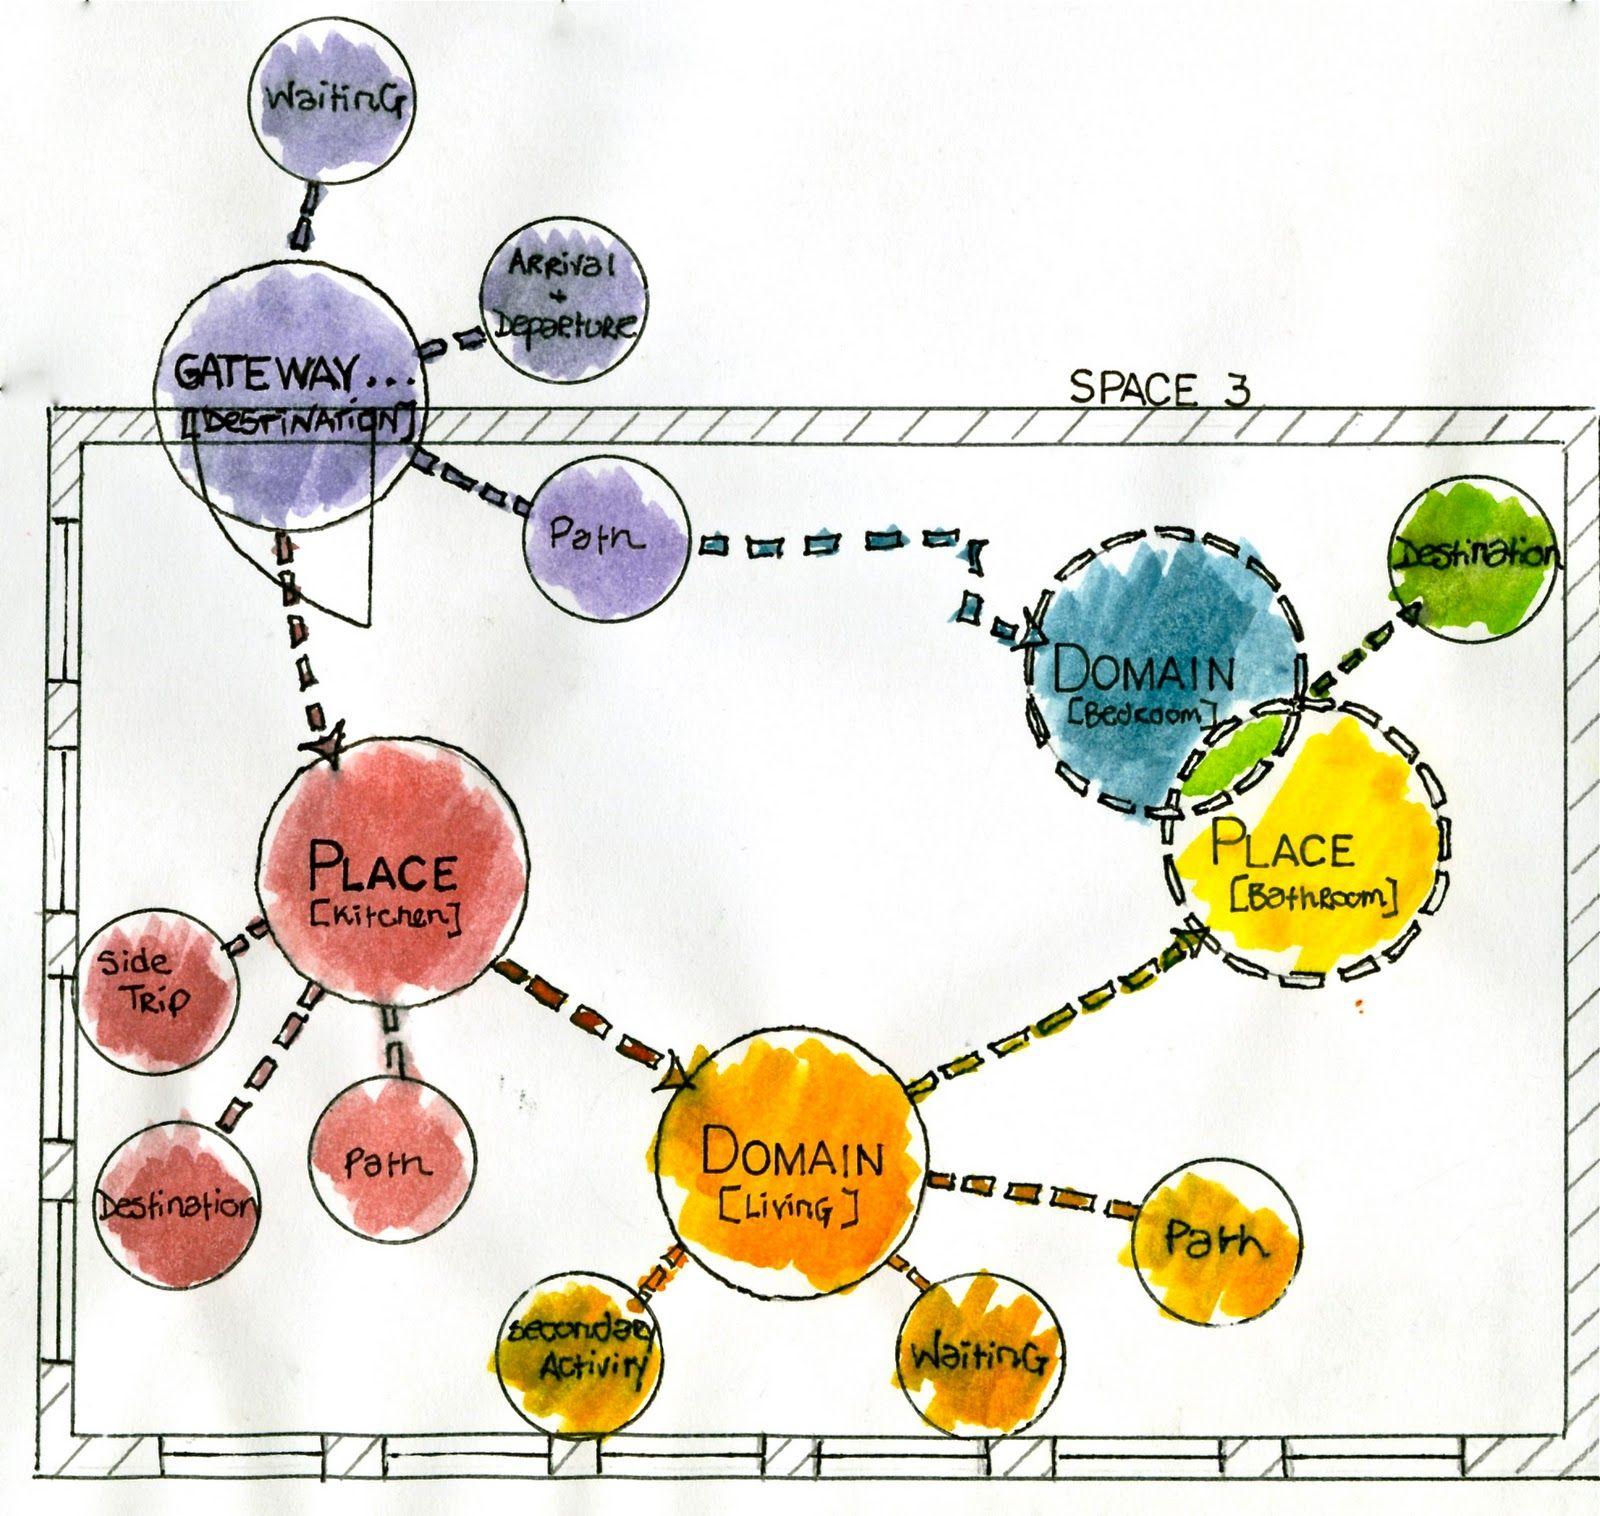 Hotel Interior Design Bubble Diagrams Tech Tips Wiring Block Diagram For Homes Schema Rh 90 Valdeig Media De